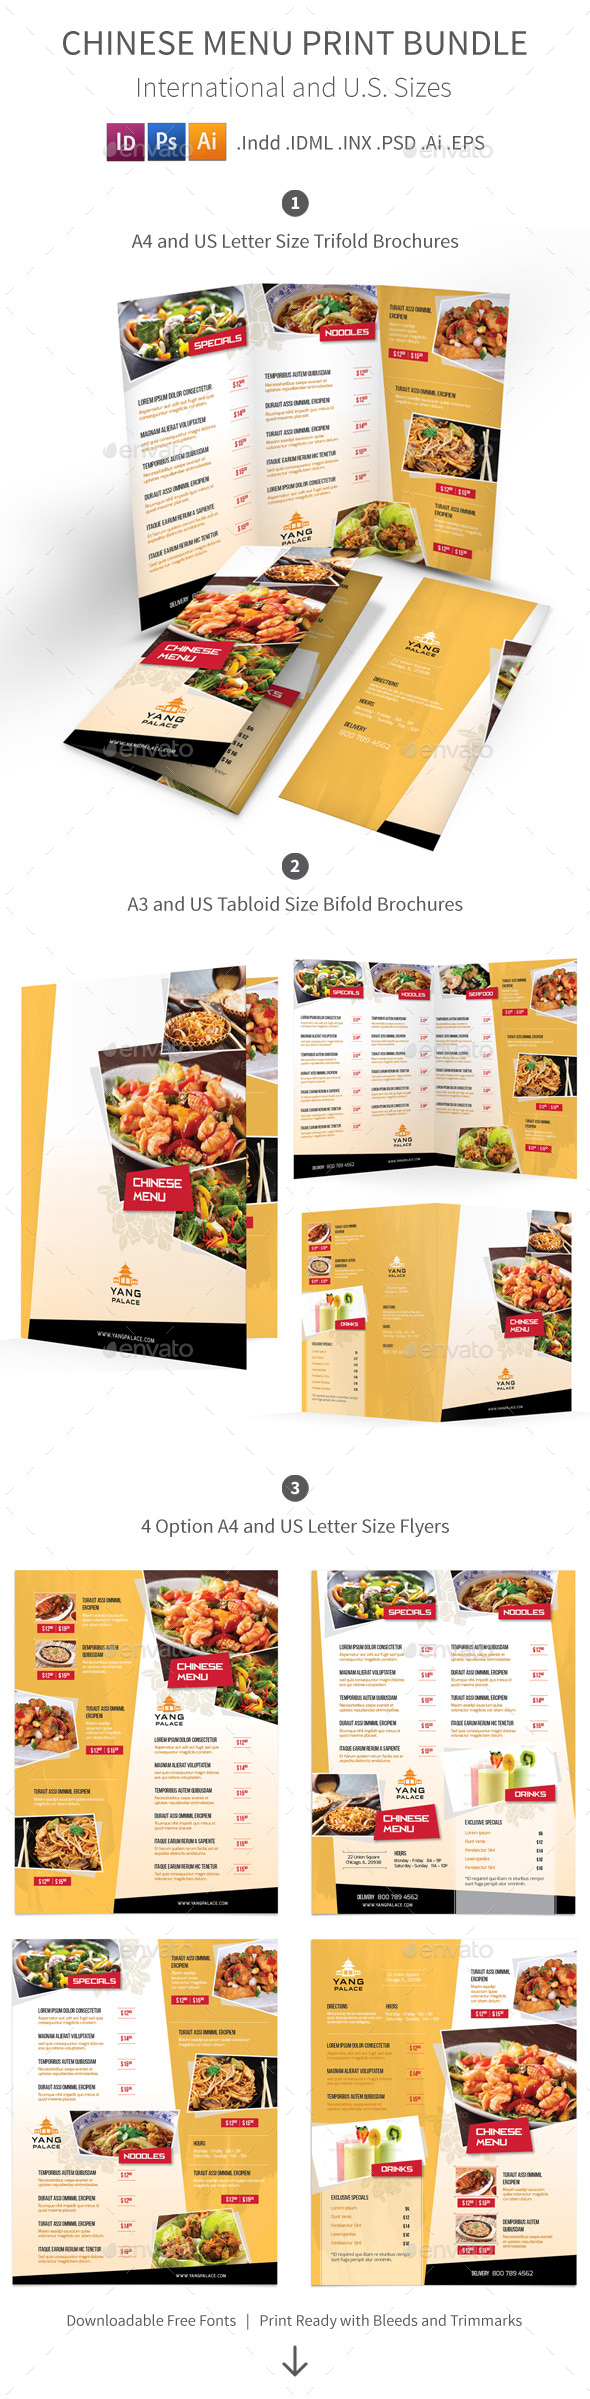 chinese restaurant menu print bundle by mike pantone graphicriver